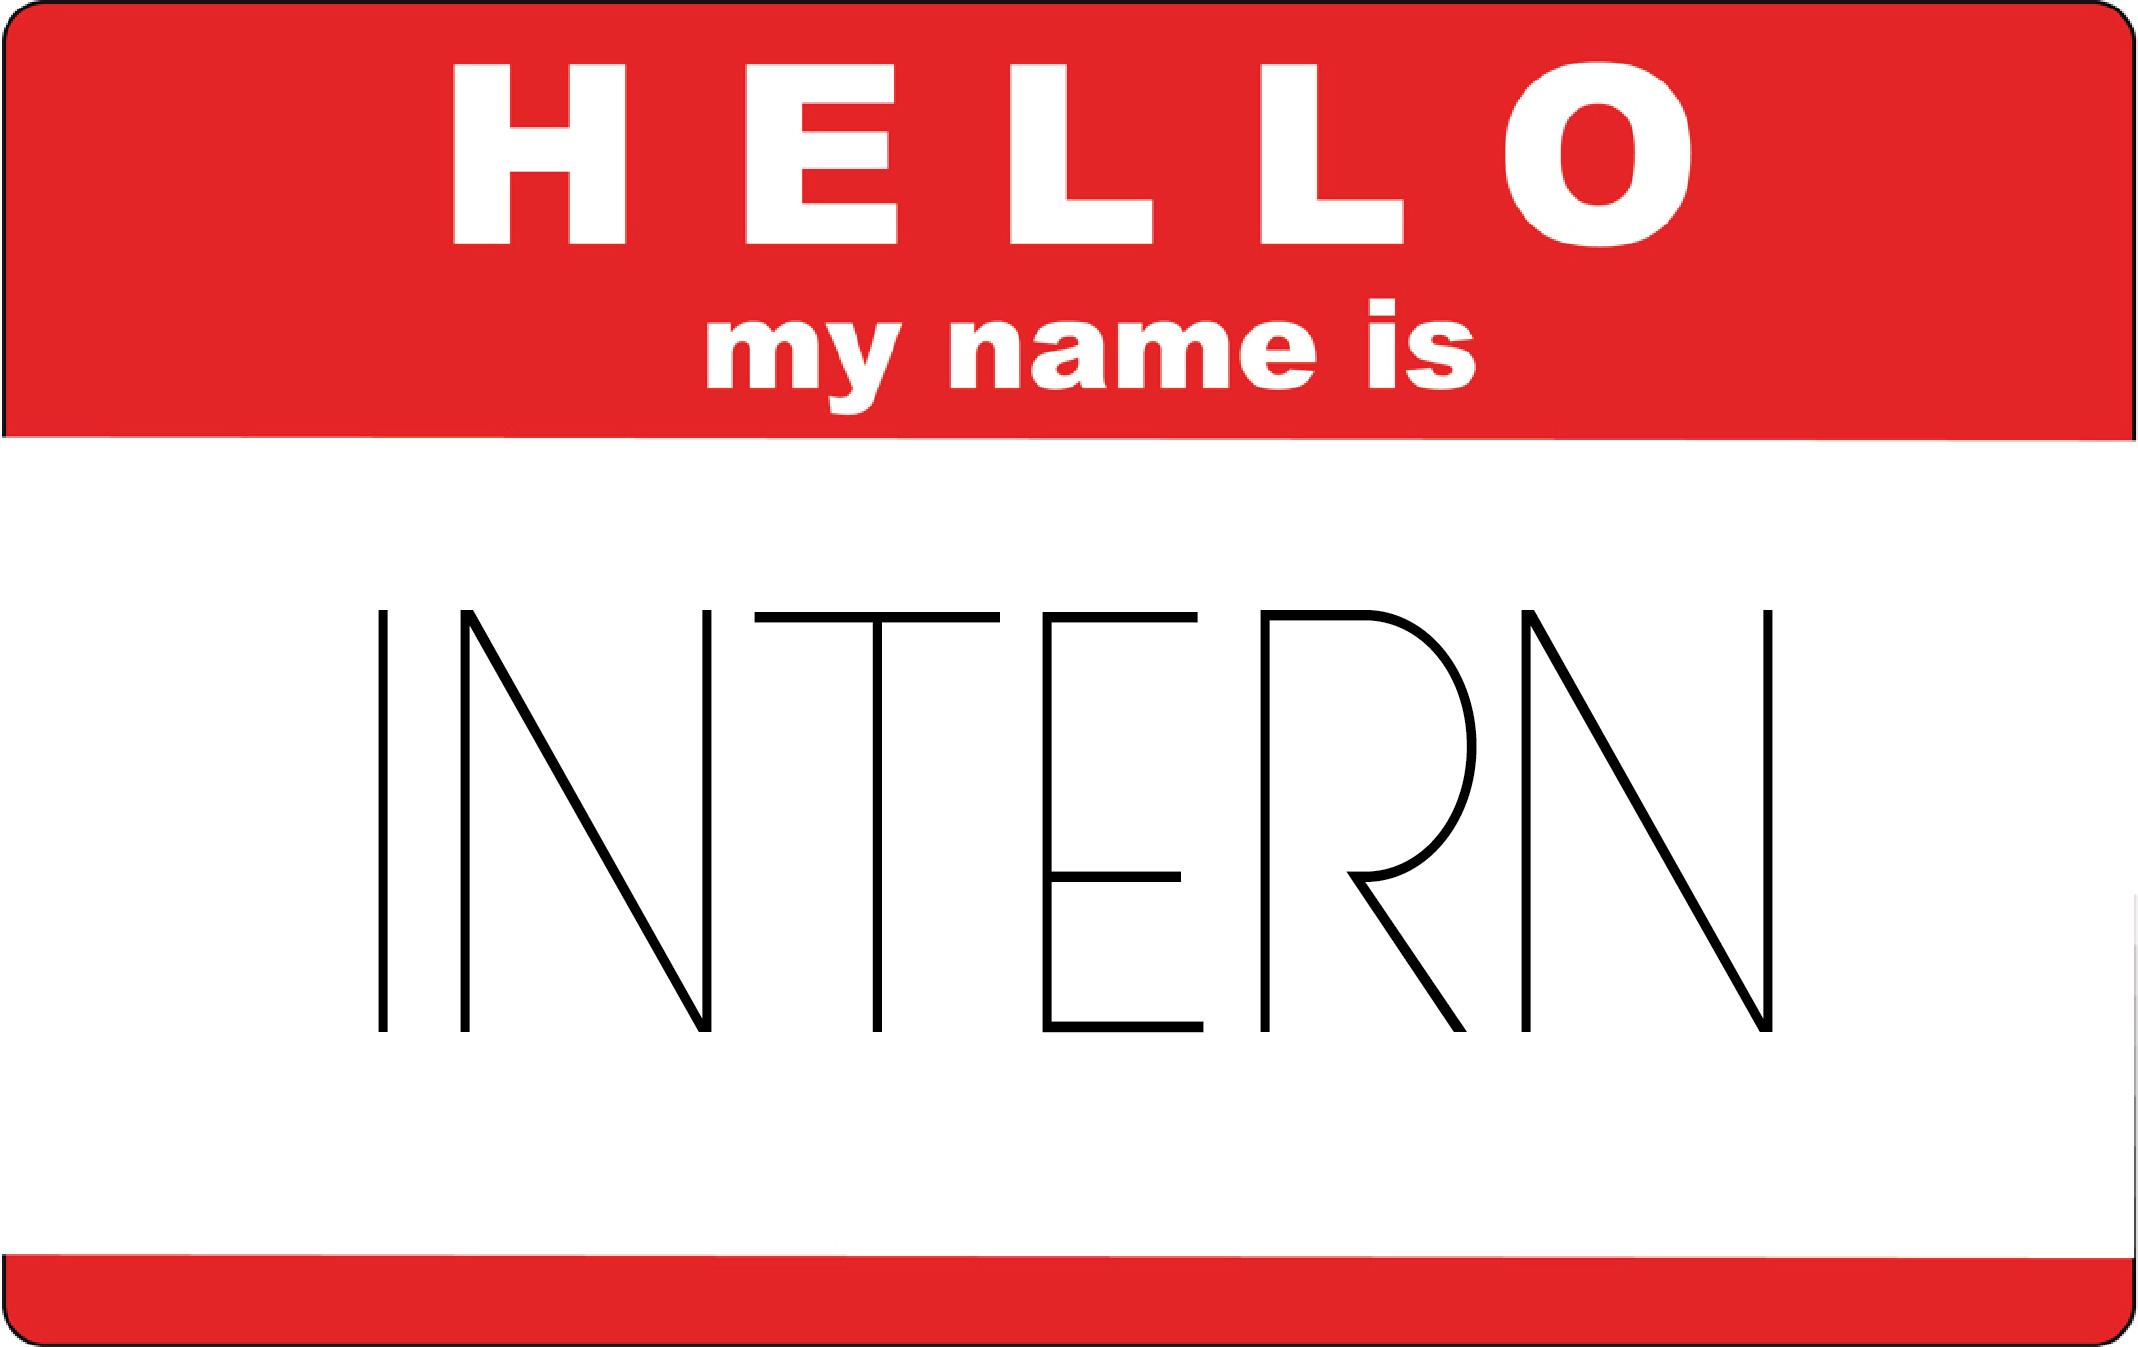 Intern.PR